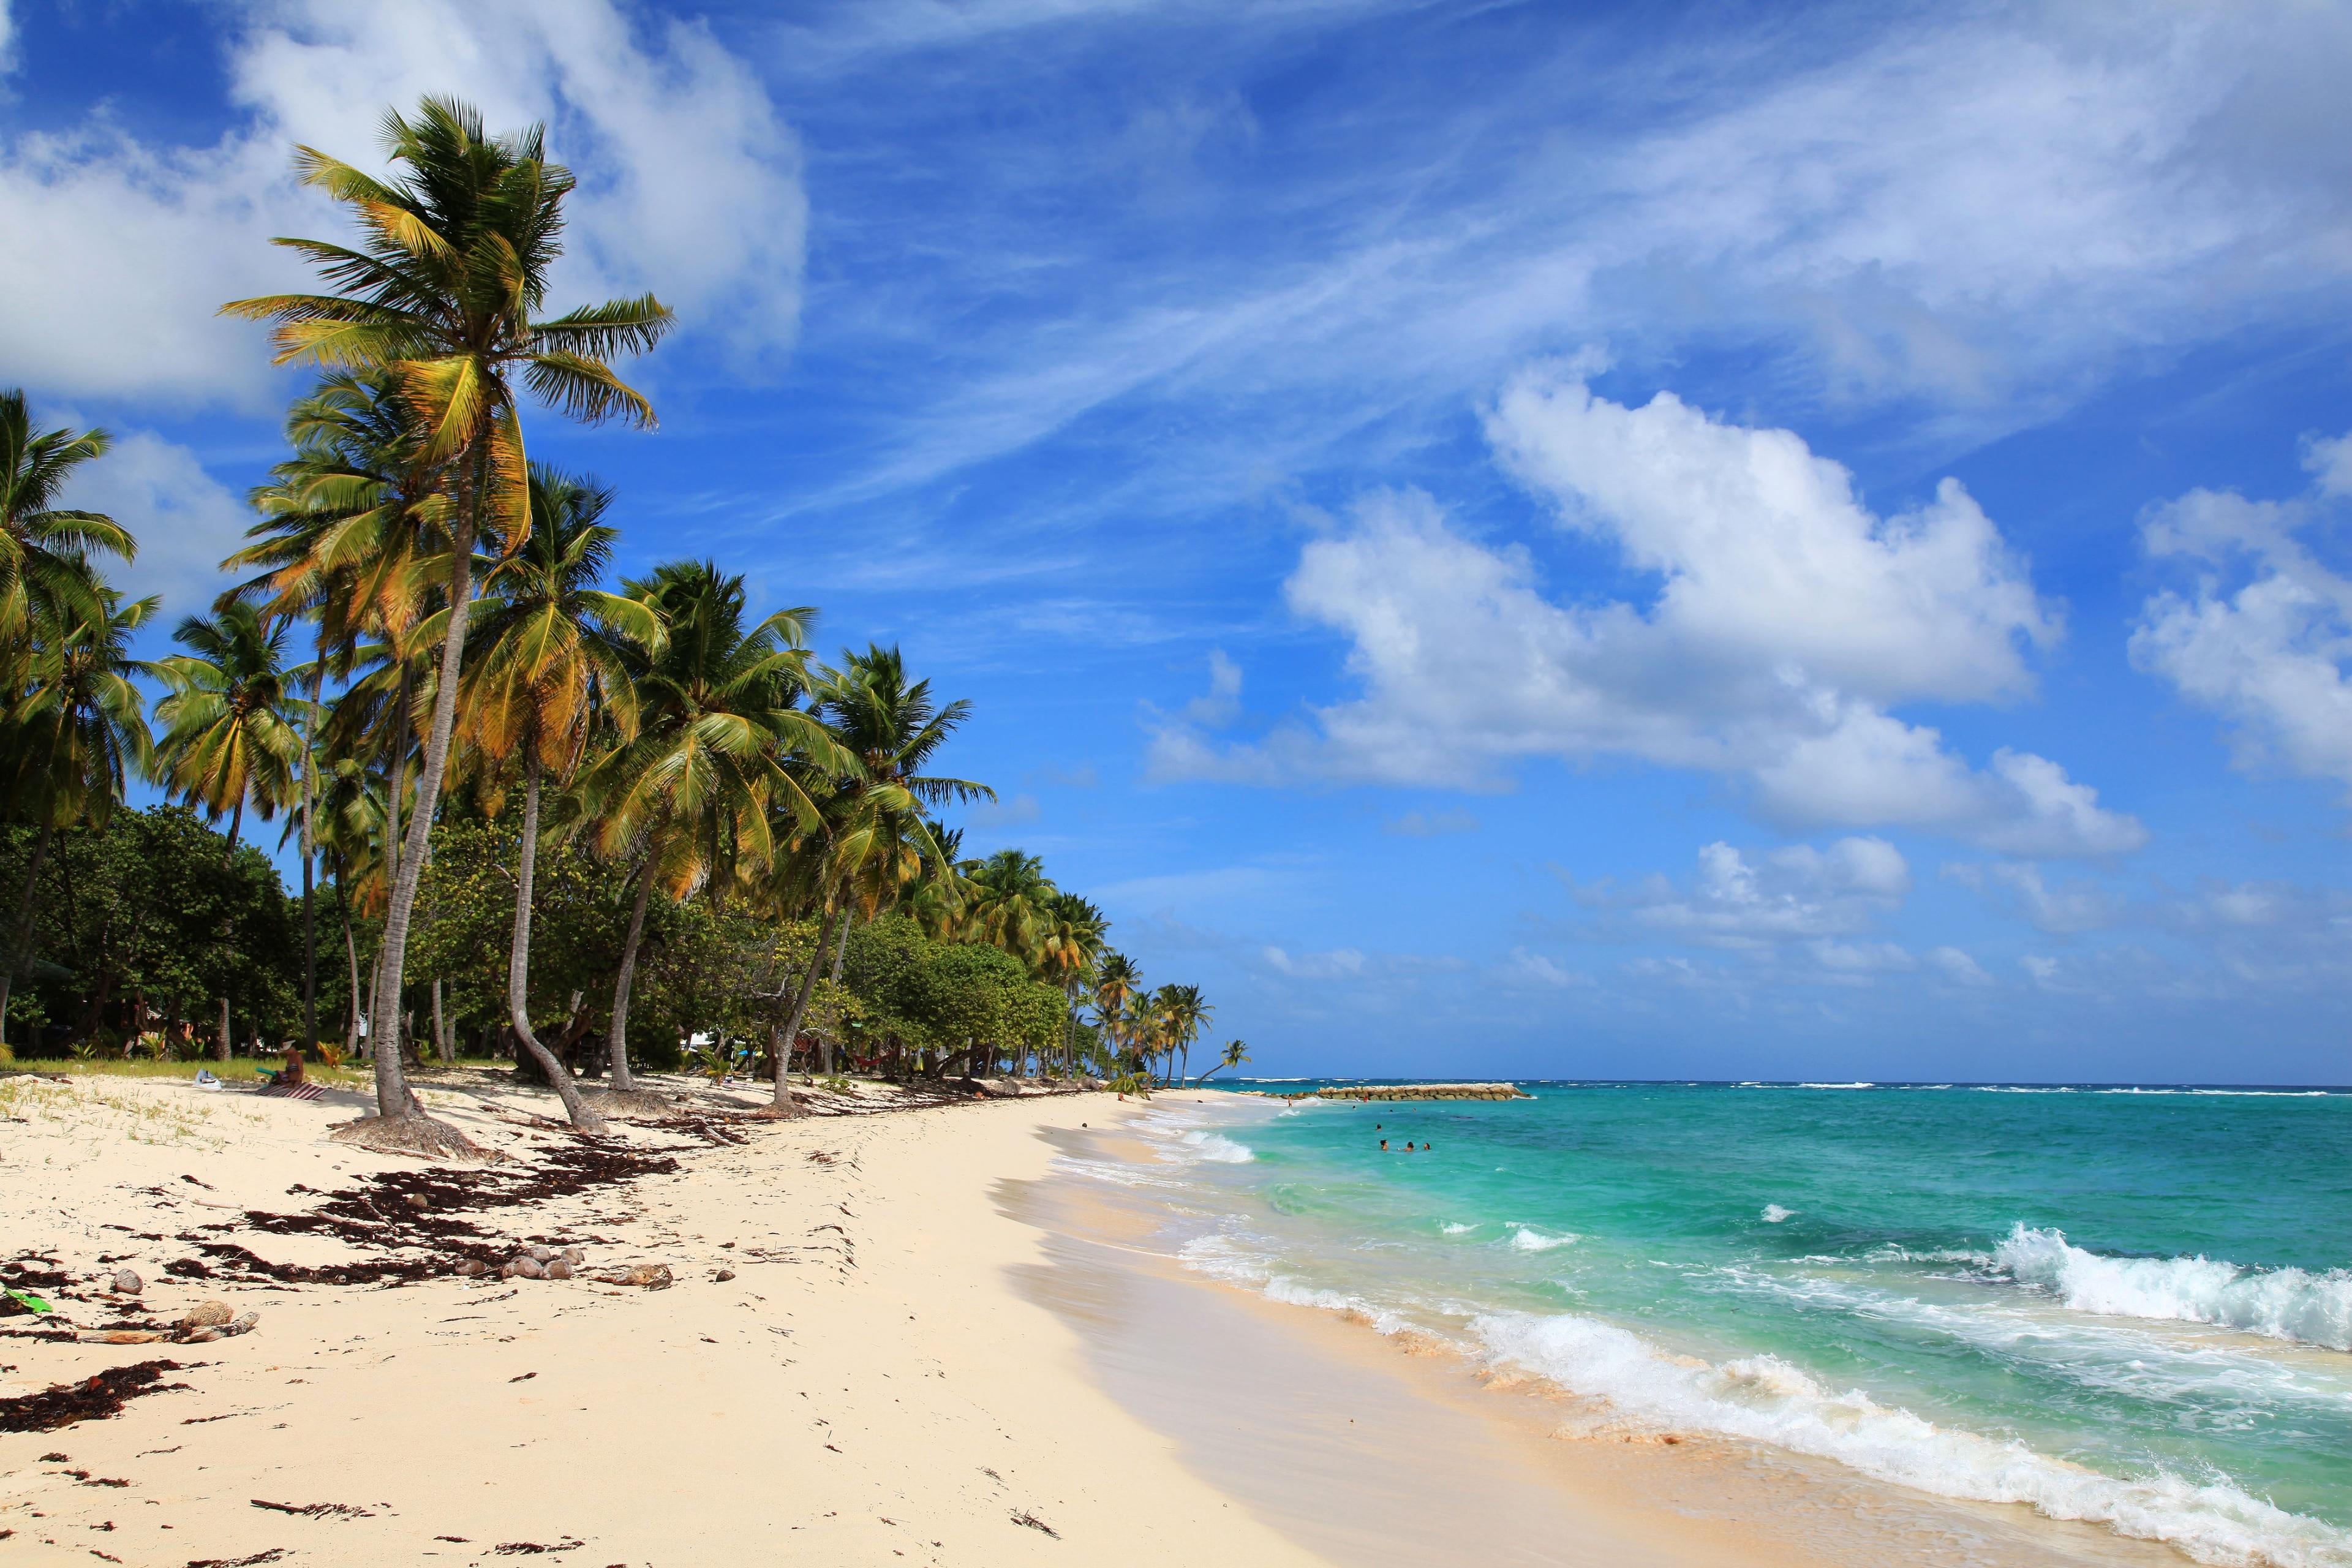 Saint-Louis, Grande-Terre, Guadeloupe